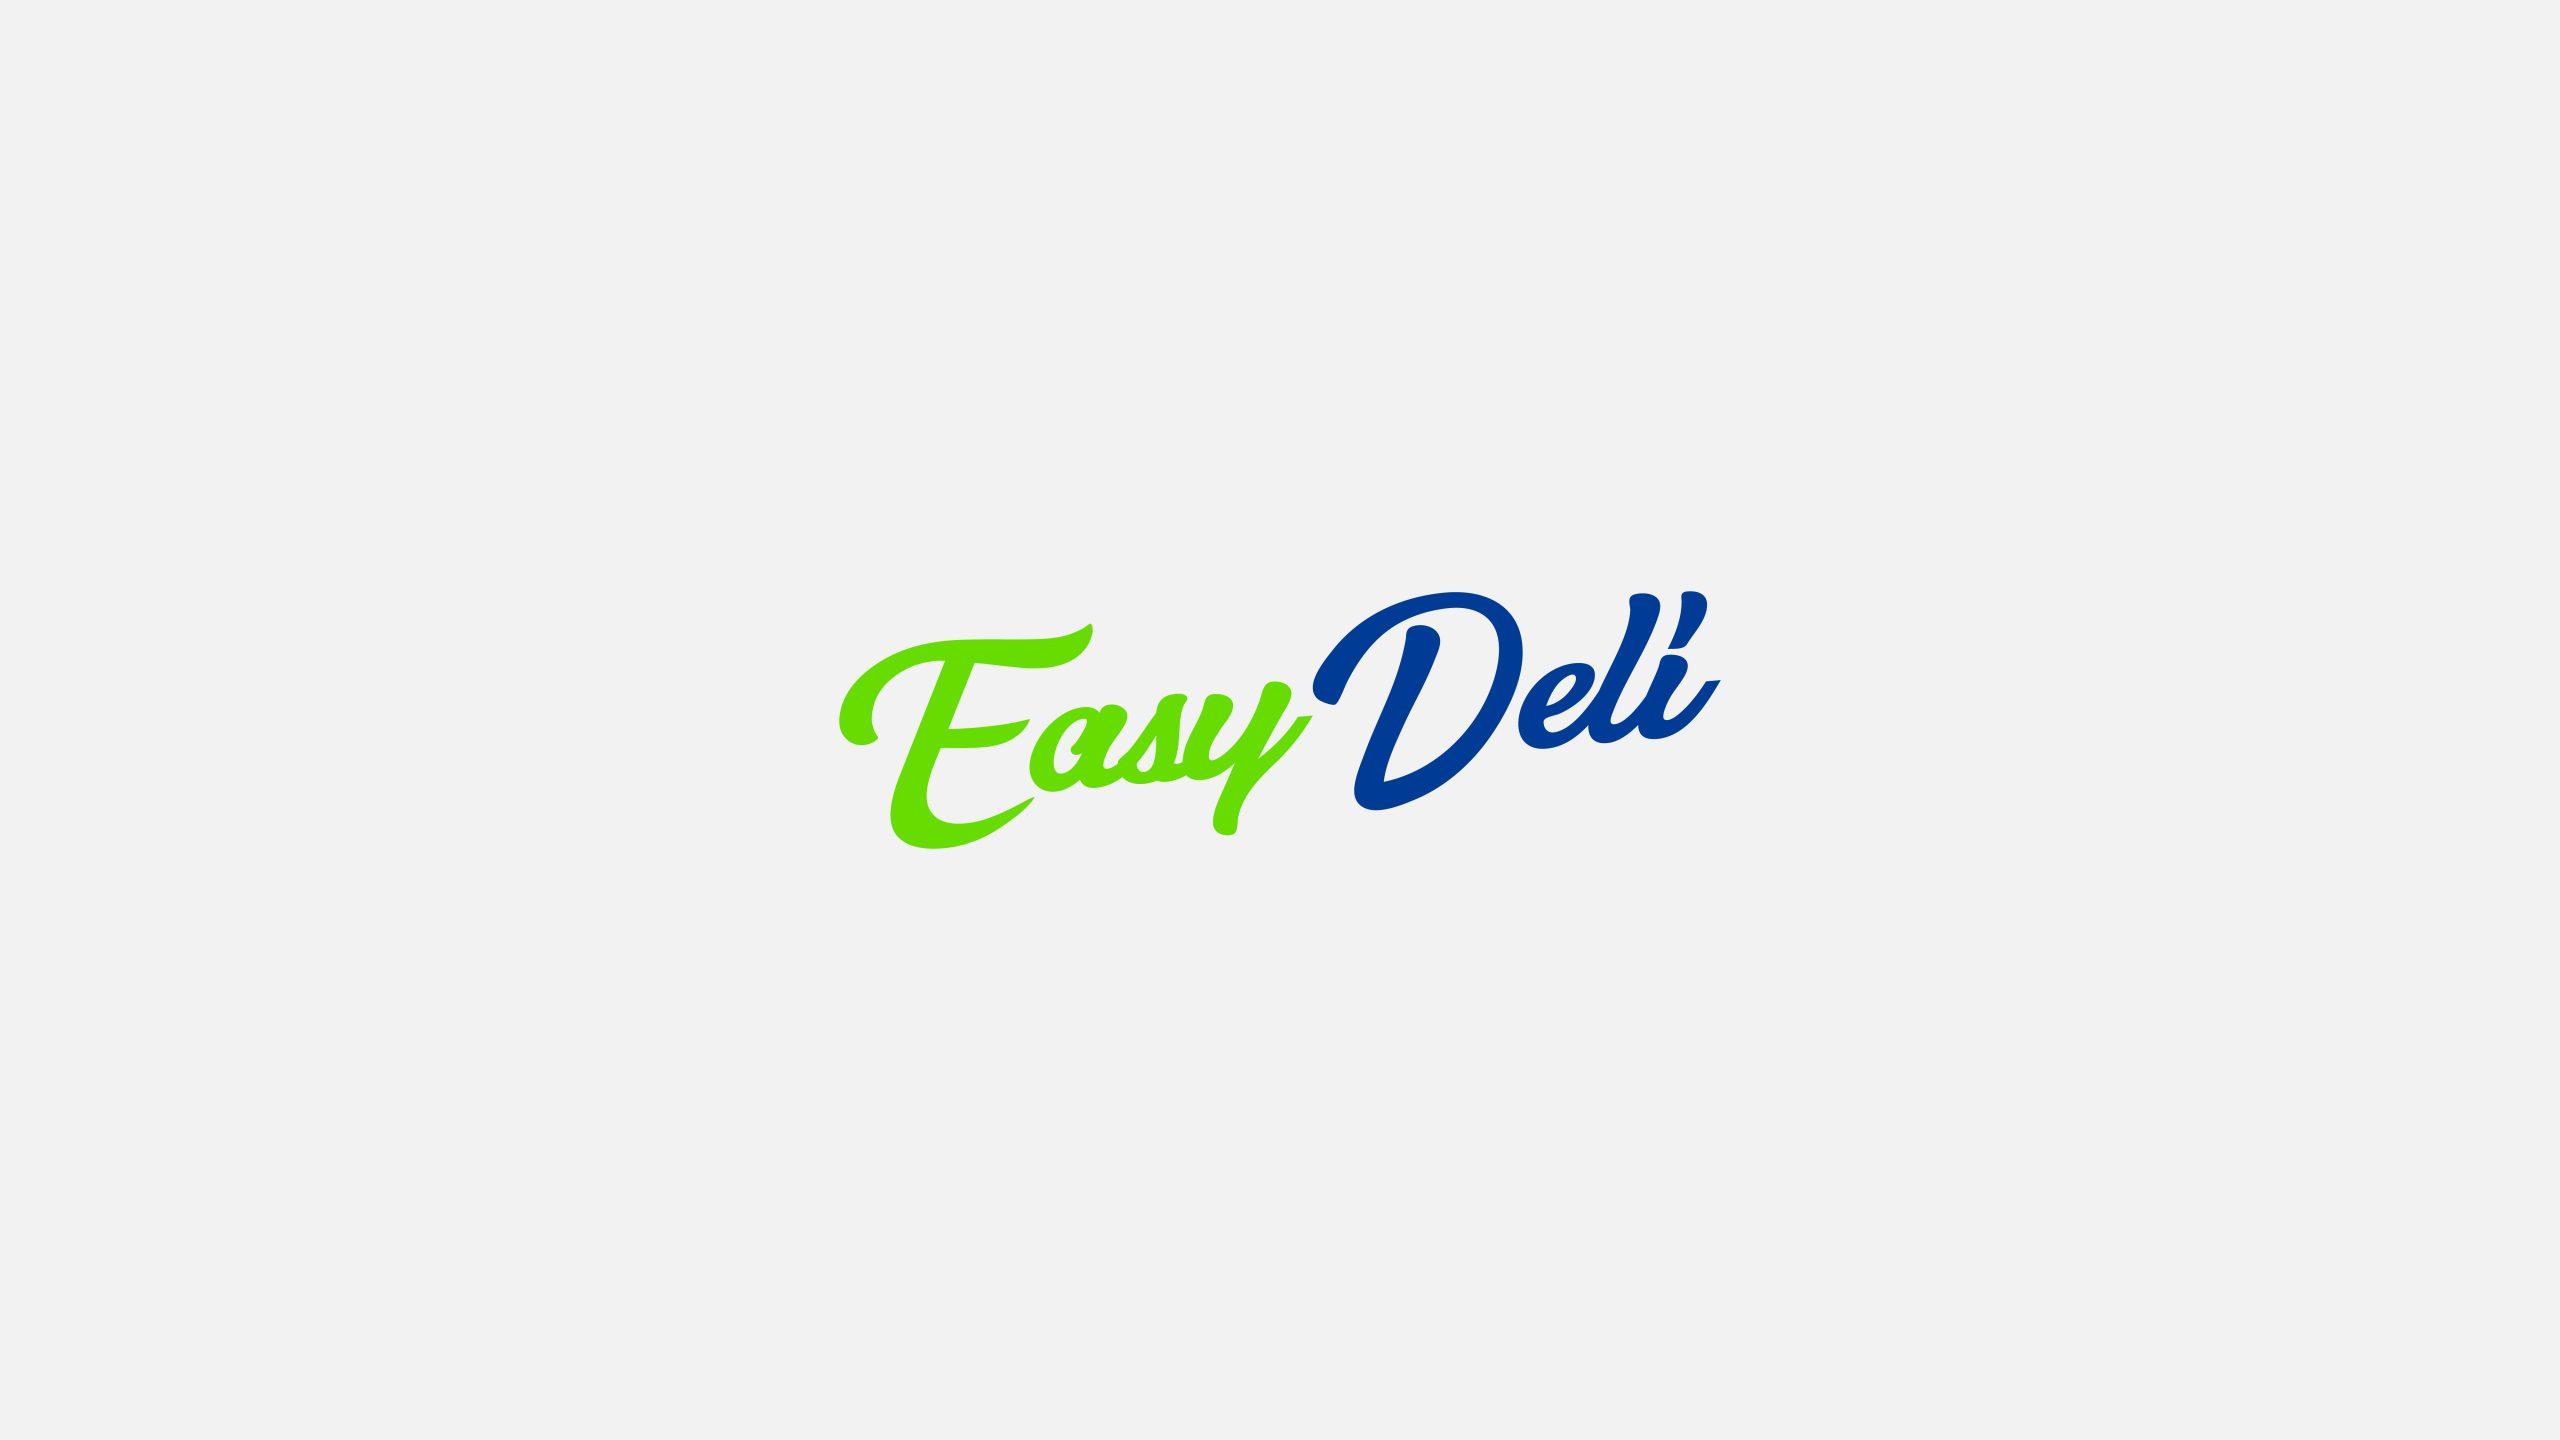 Easy-Deli-01